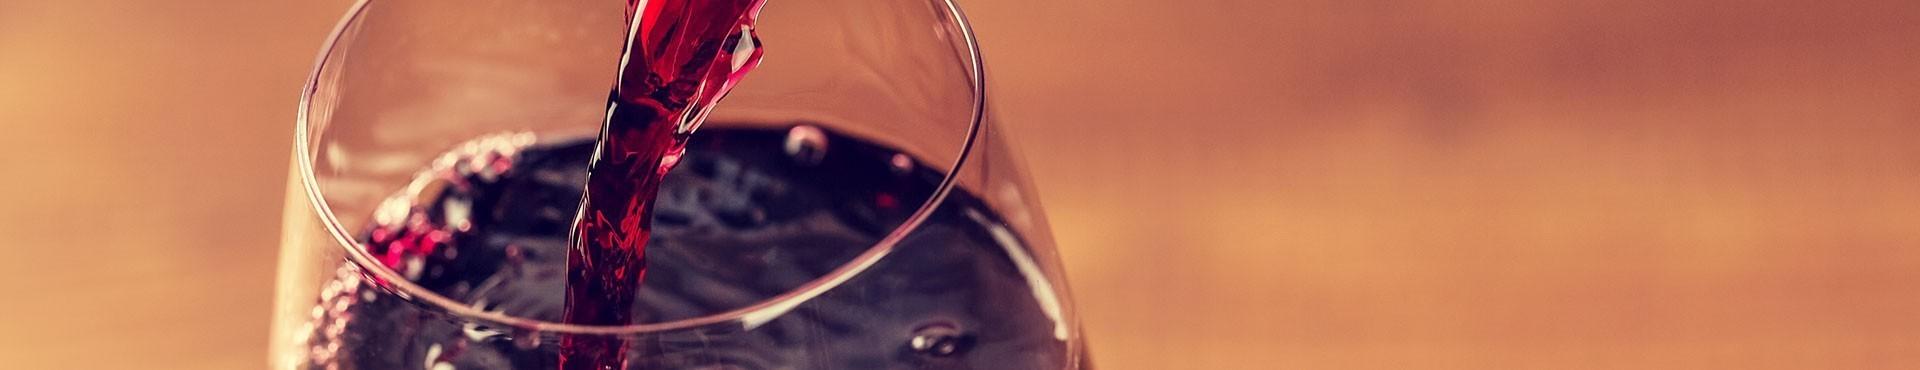 Nos vins rouges du Beaujolais - OnWine